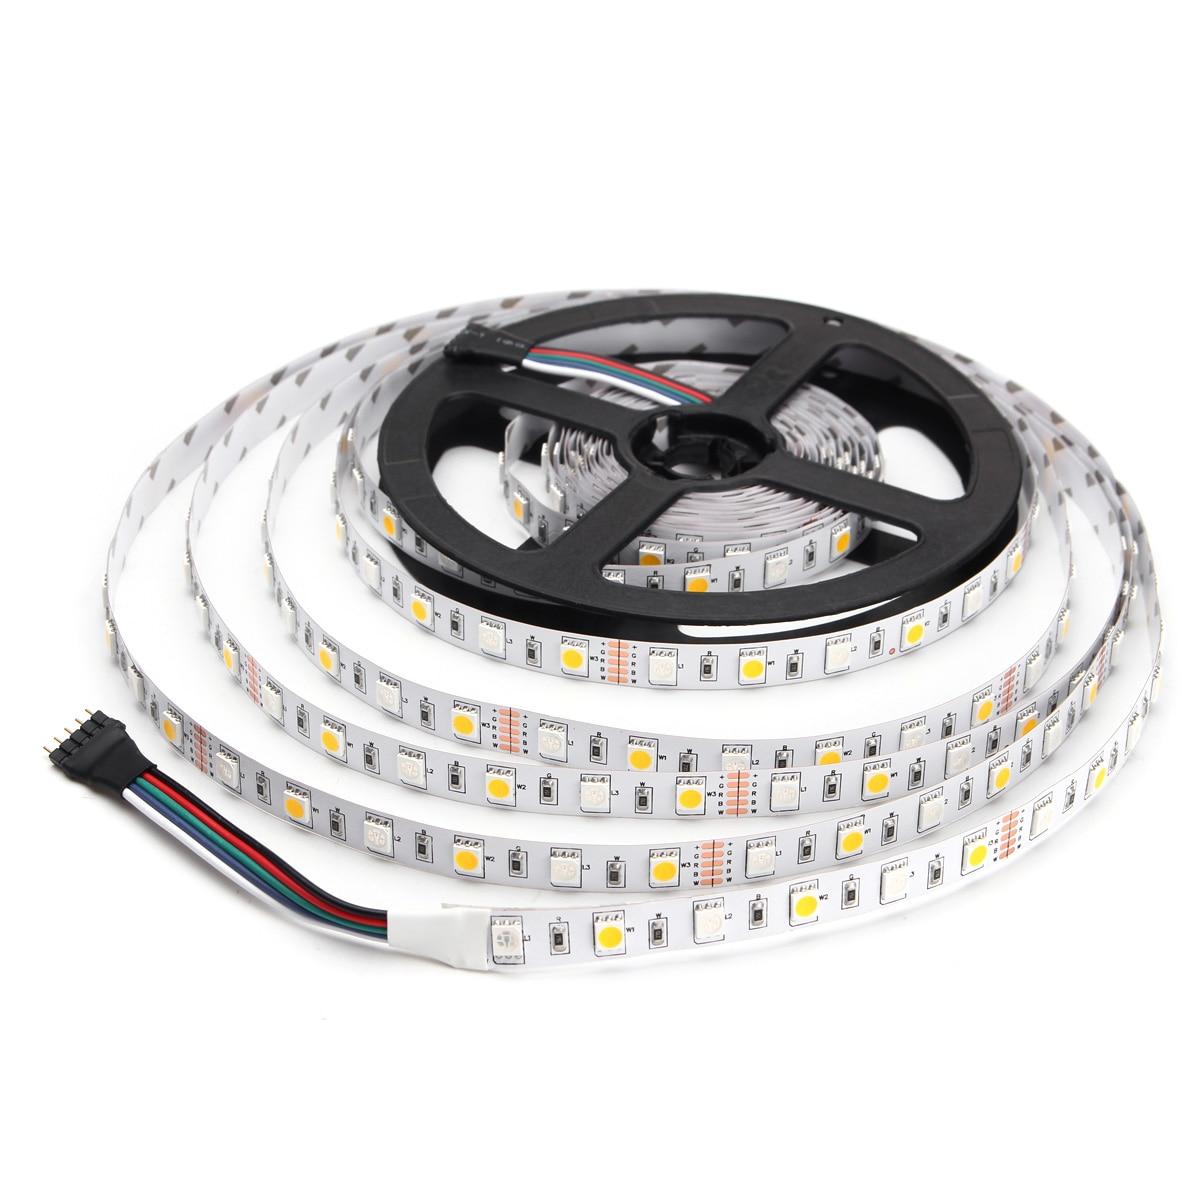 все цены на Smuxi 5M LED Strip 5050 RGBW DC 12V Flexible LED Light RGB + White / RGB + Warm White 60 LED/m Light No Waterproof онлайн